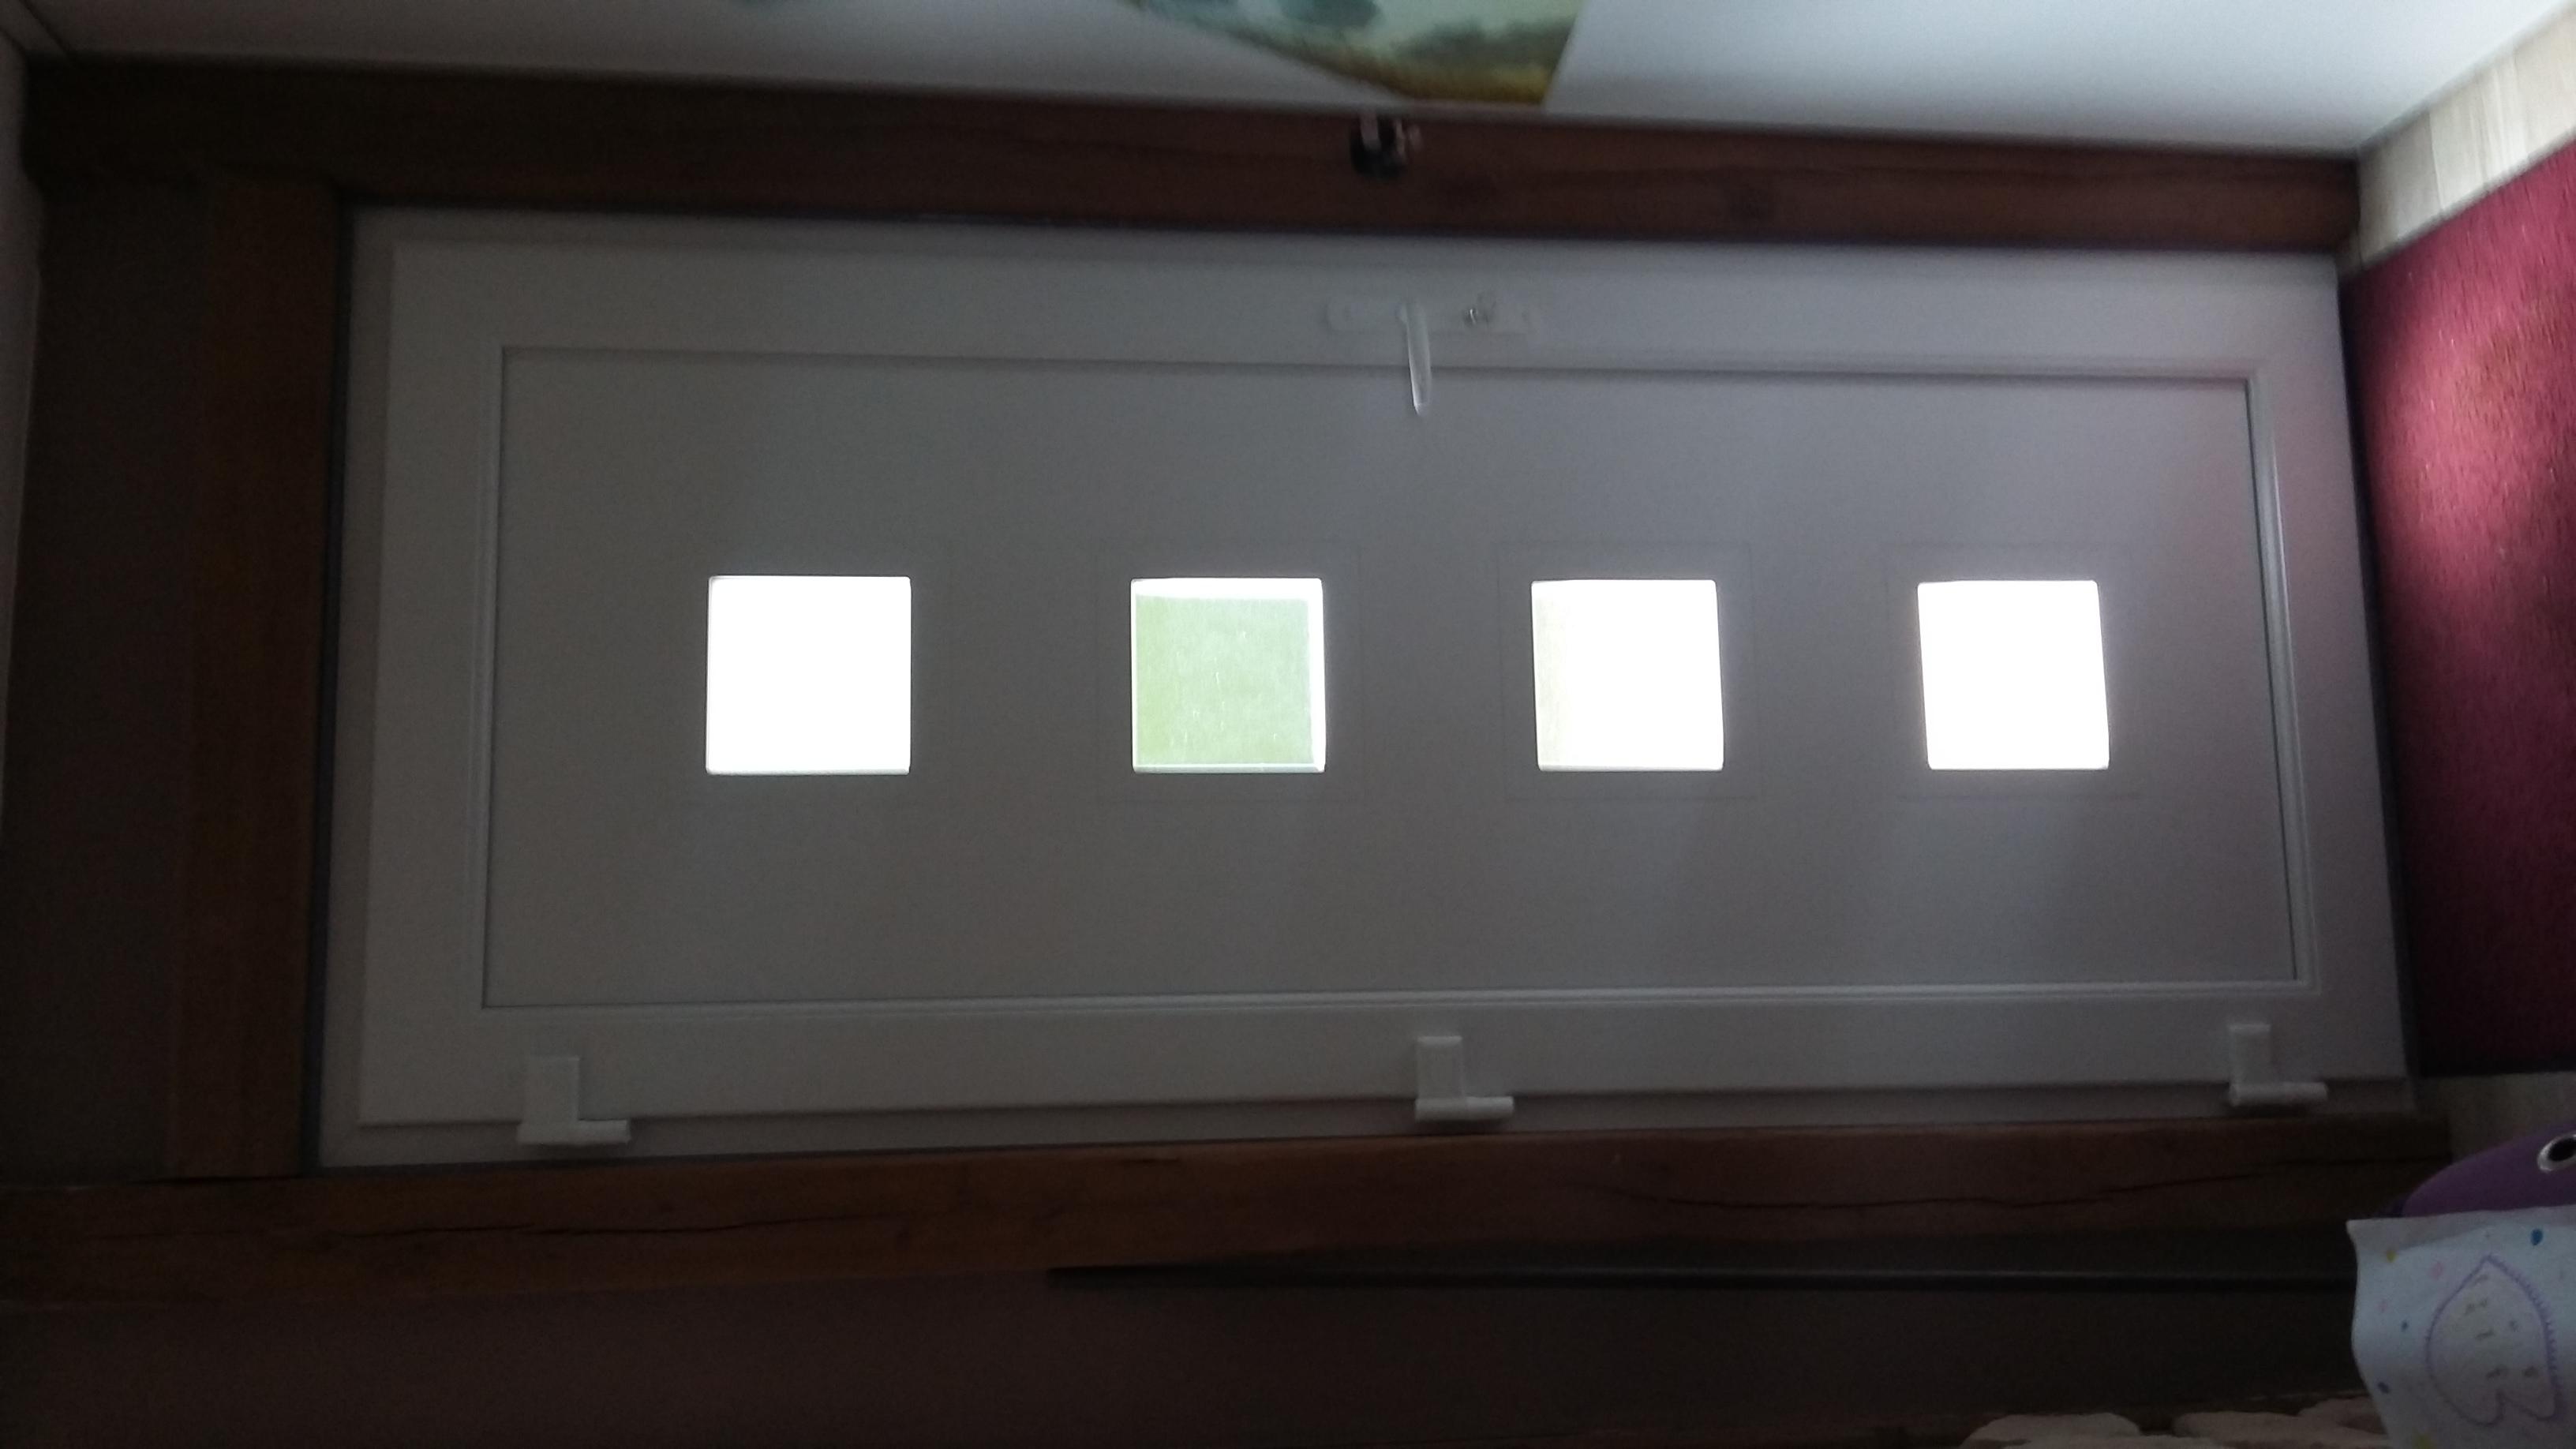 porte-d-entree-pvc-blanc-sur-mesure-vitree-moderne-style-28-78-91-75-27